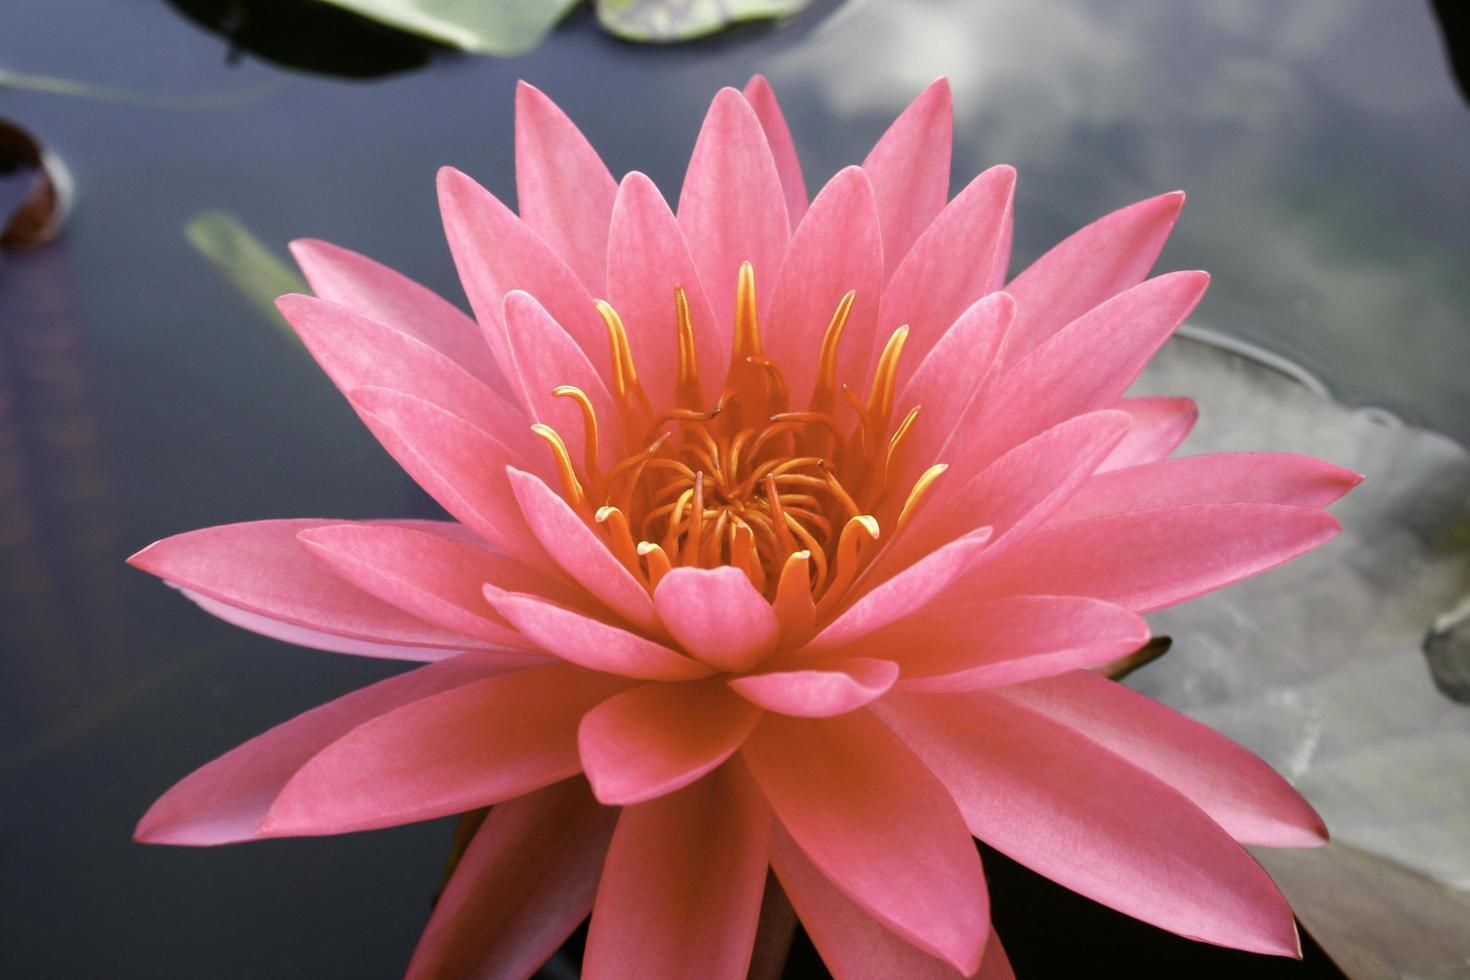 rosa Lotusblume im Wasser foto